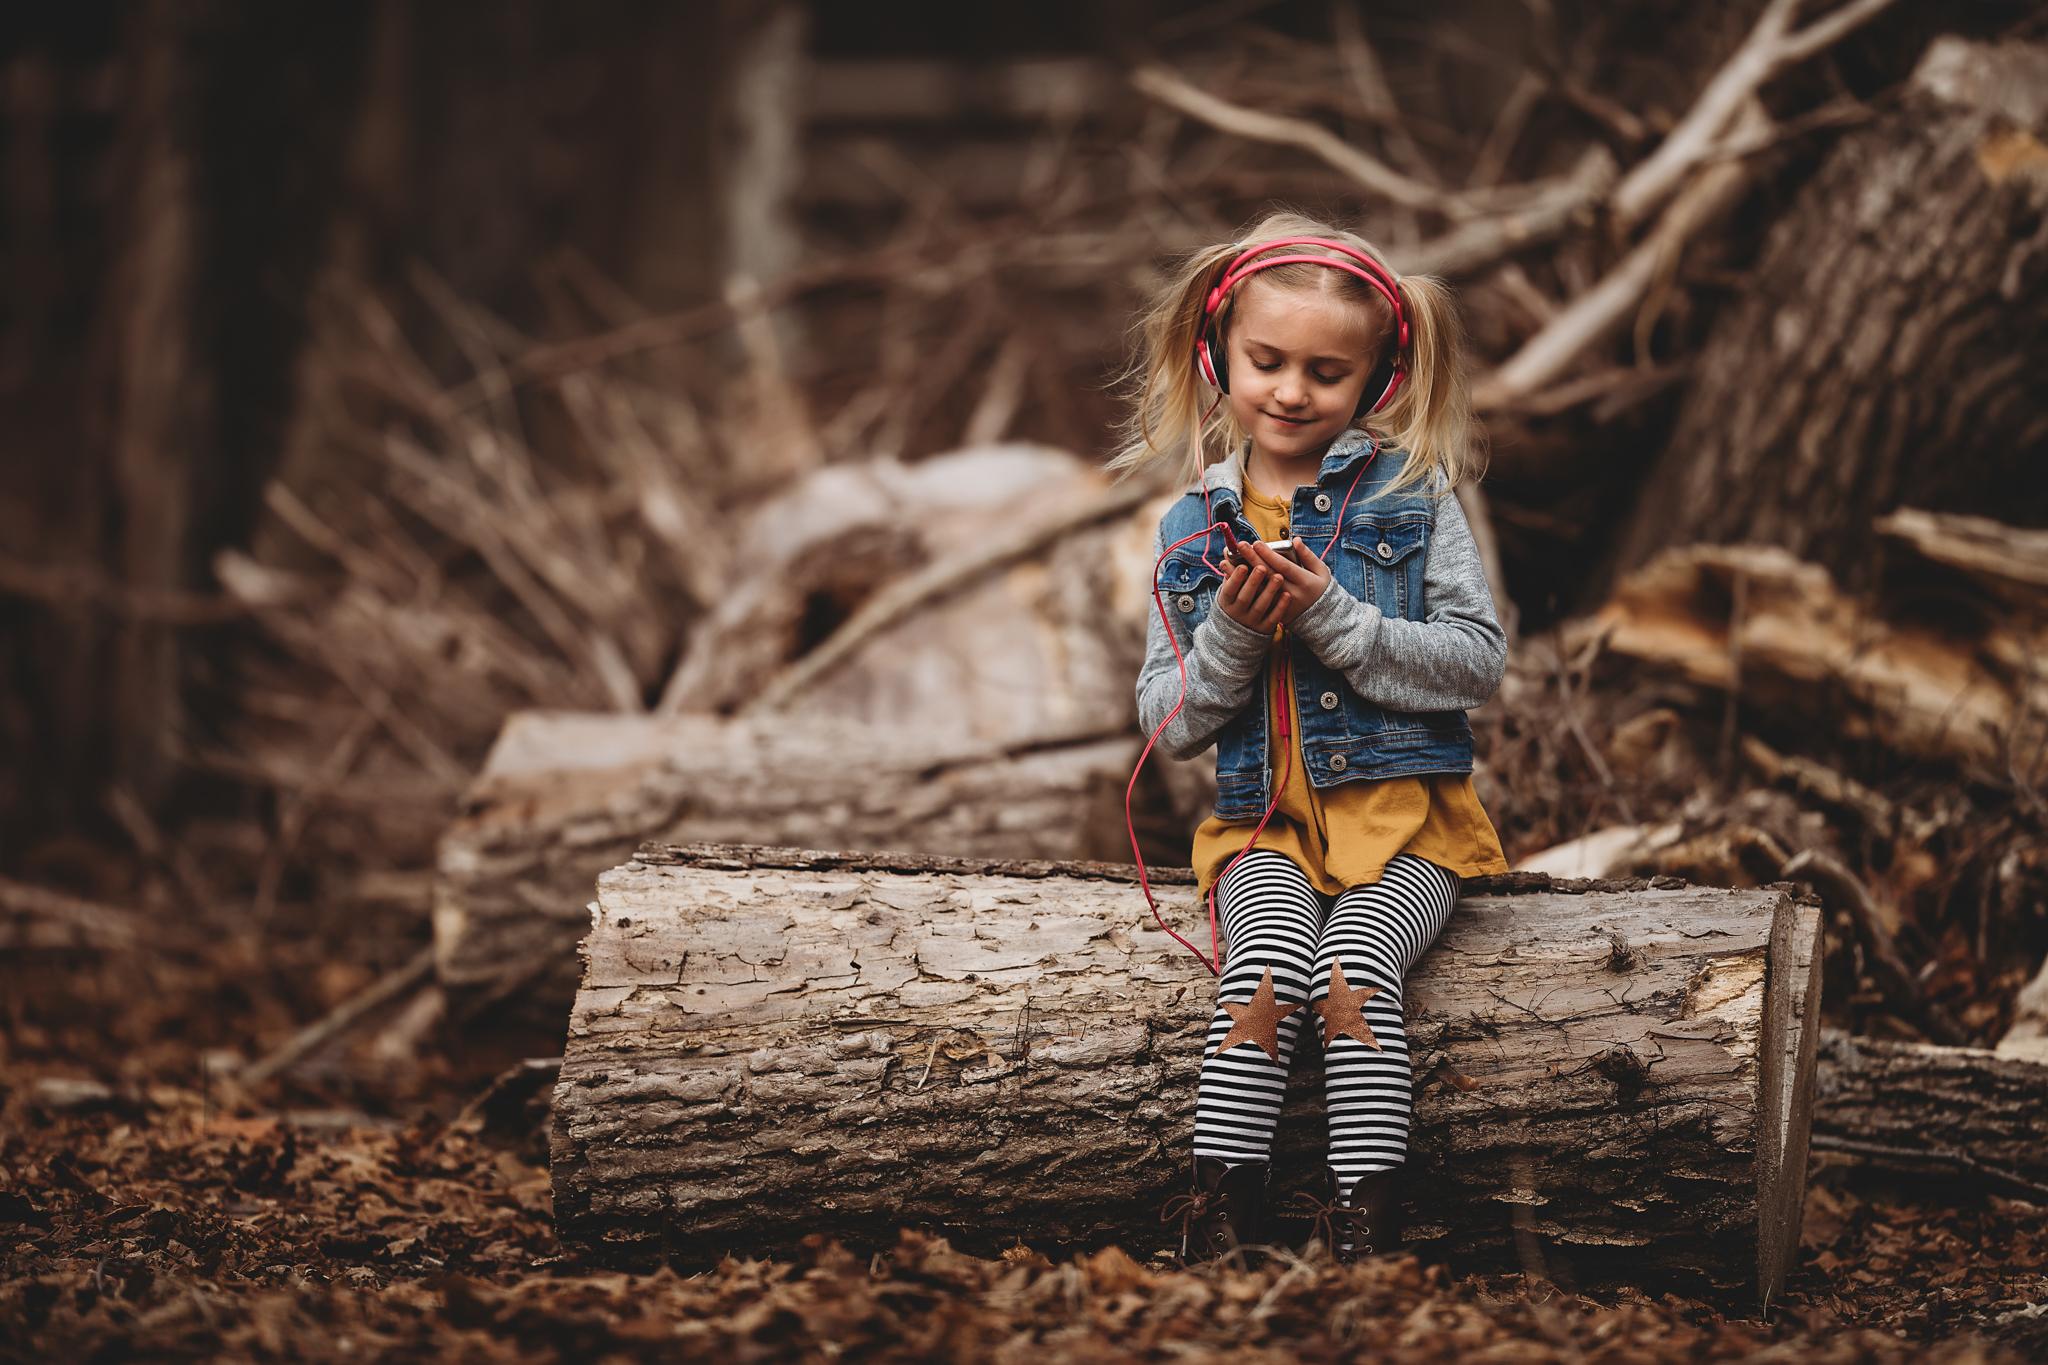 Long-island-photographer-hello-olivia-photography-children-kids-photos-new-york-lifestyle-portraits-suffolk-County-LI-44.jpg